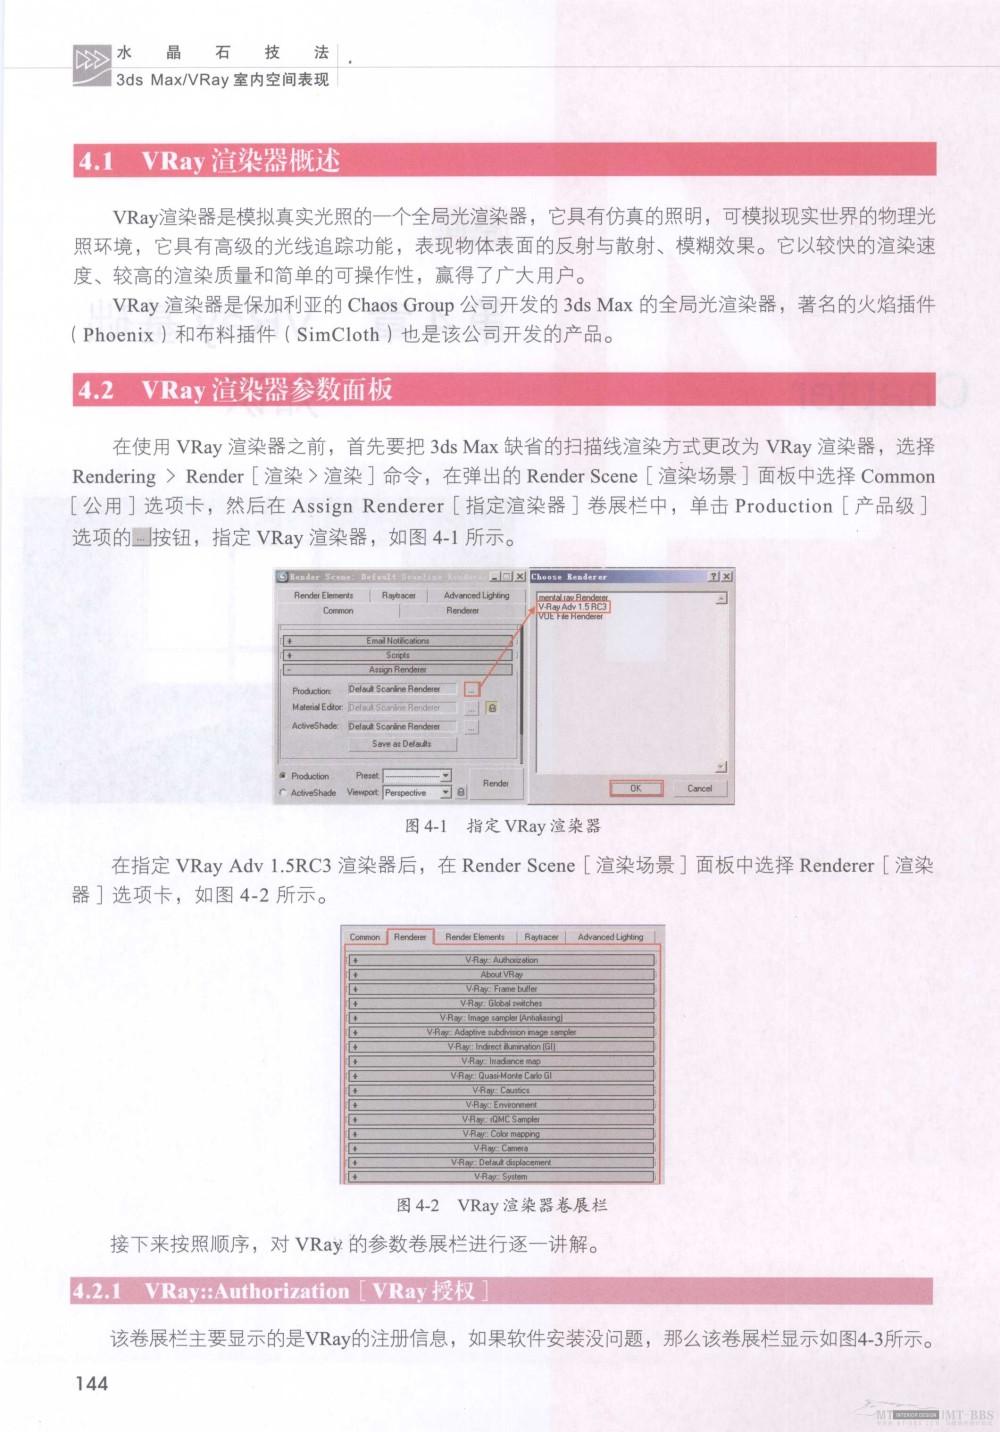 水晶石技法-3ds_Max&VRay室内空间表现_水晶石技法-3ds_Max&VRay室内空间表现_页面_150.jpg